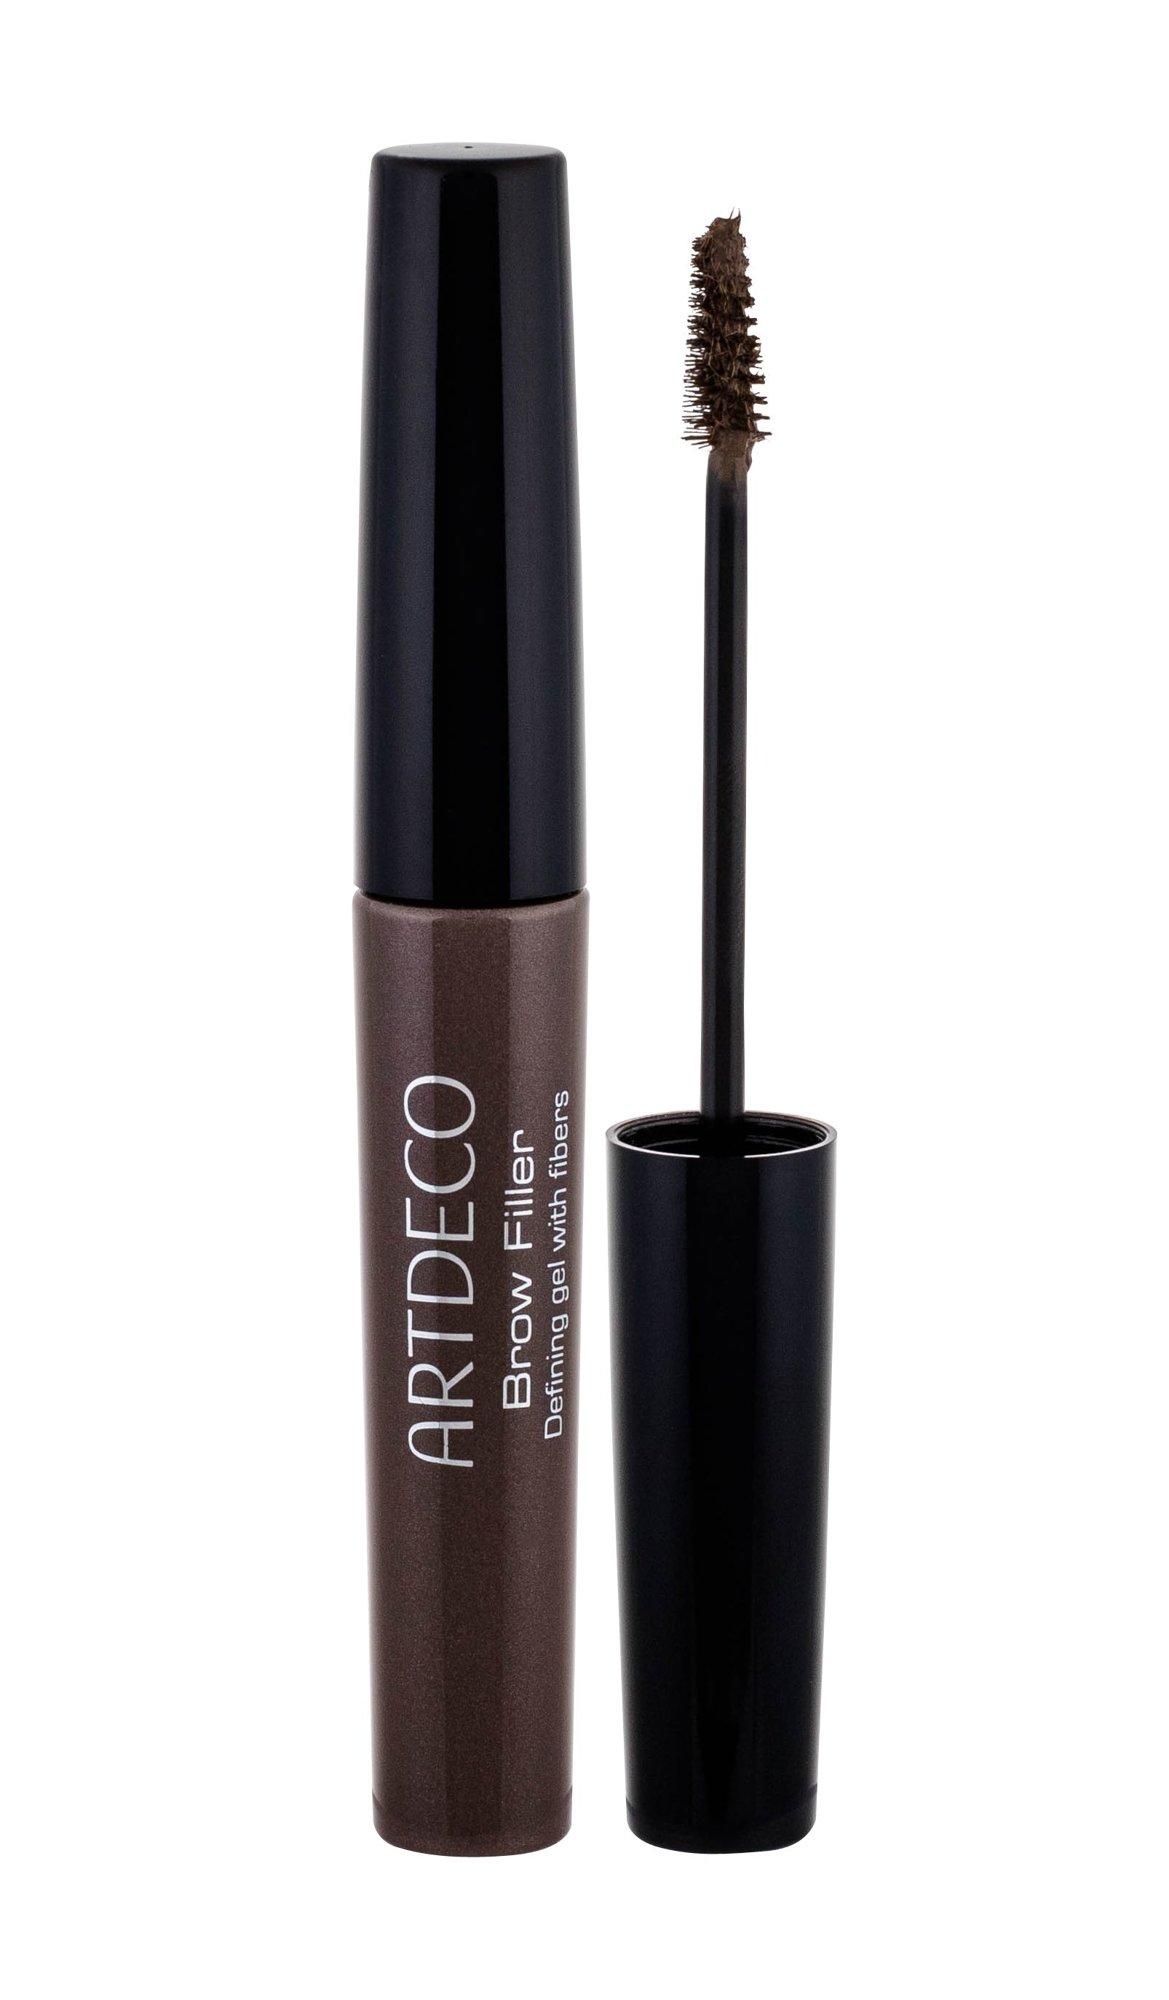 Artdeco Brow Filler Eyebrow Mascara 7ml 2 Light Brown